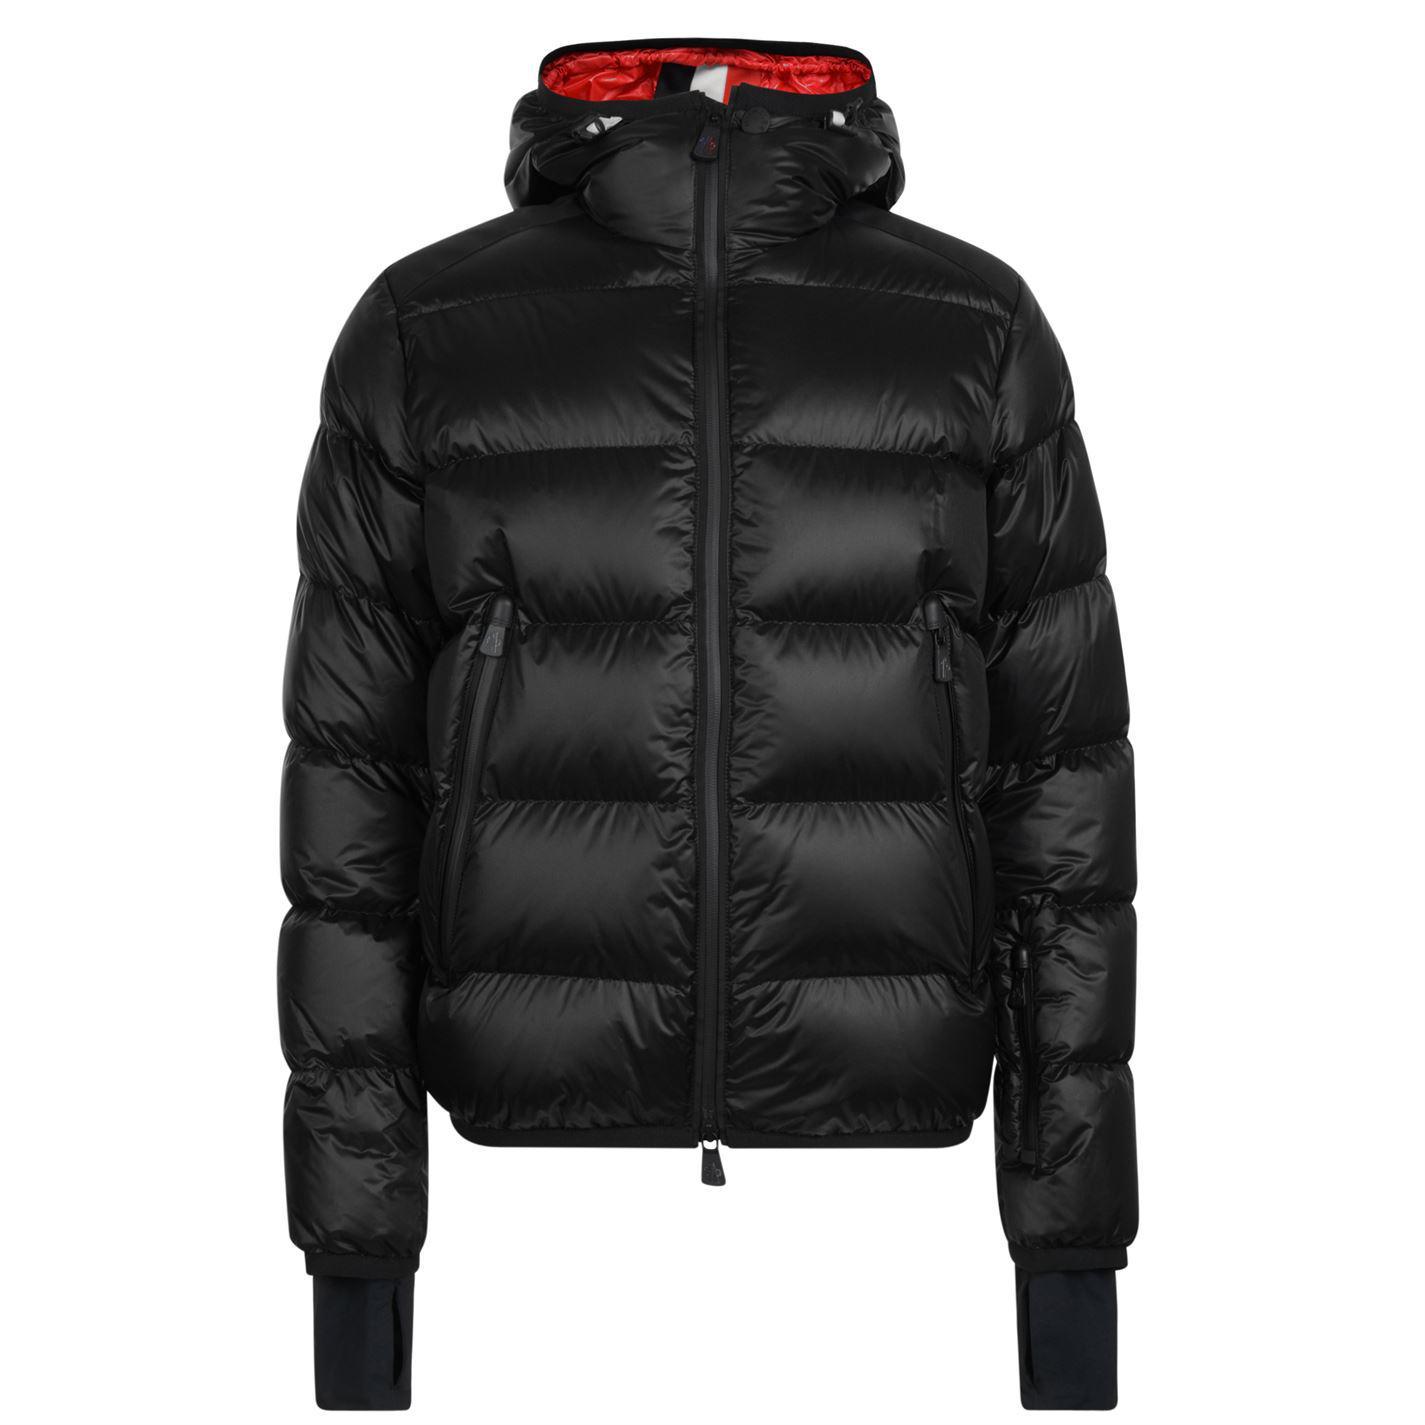 Moncler Grenoble. Men's Black Hintertux Padded Jacket